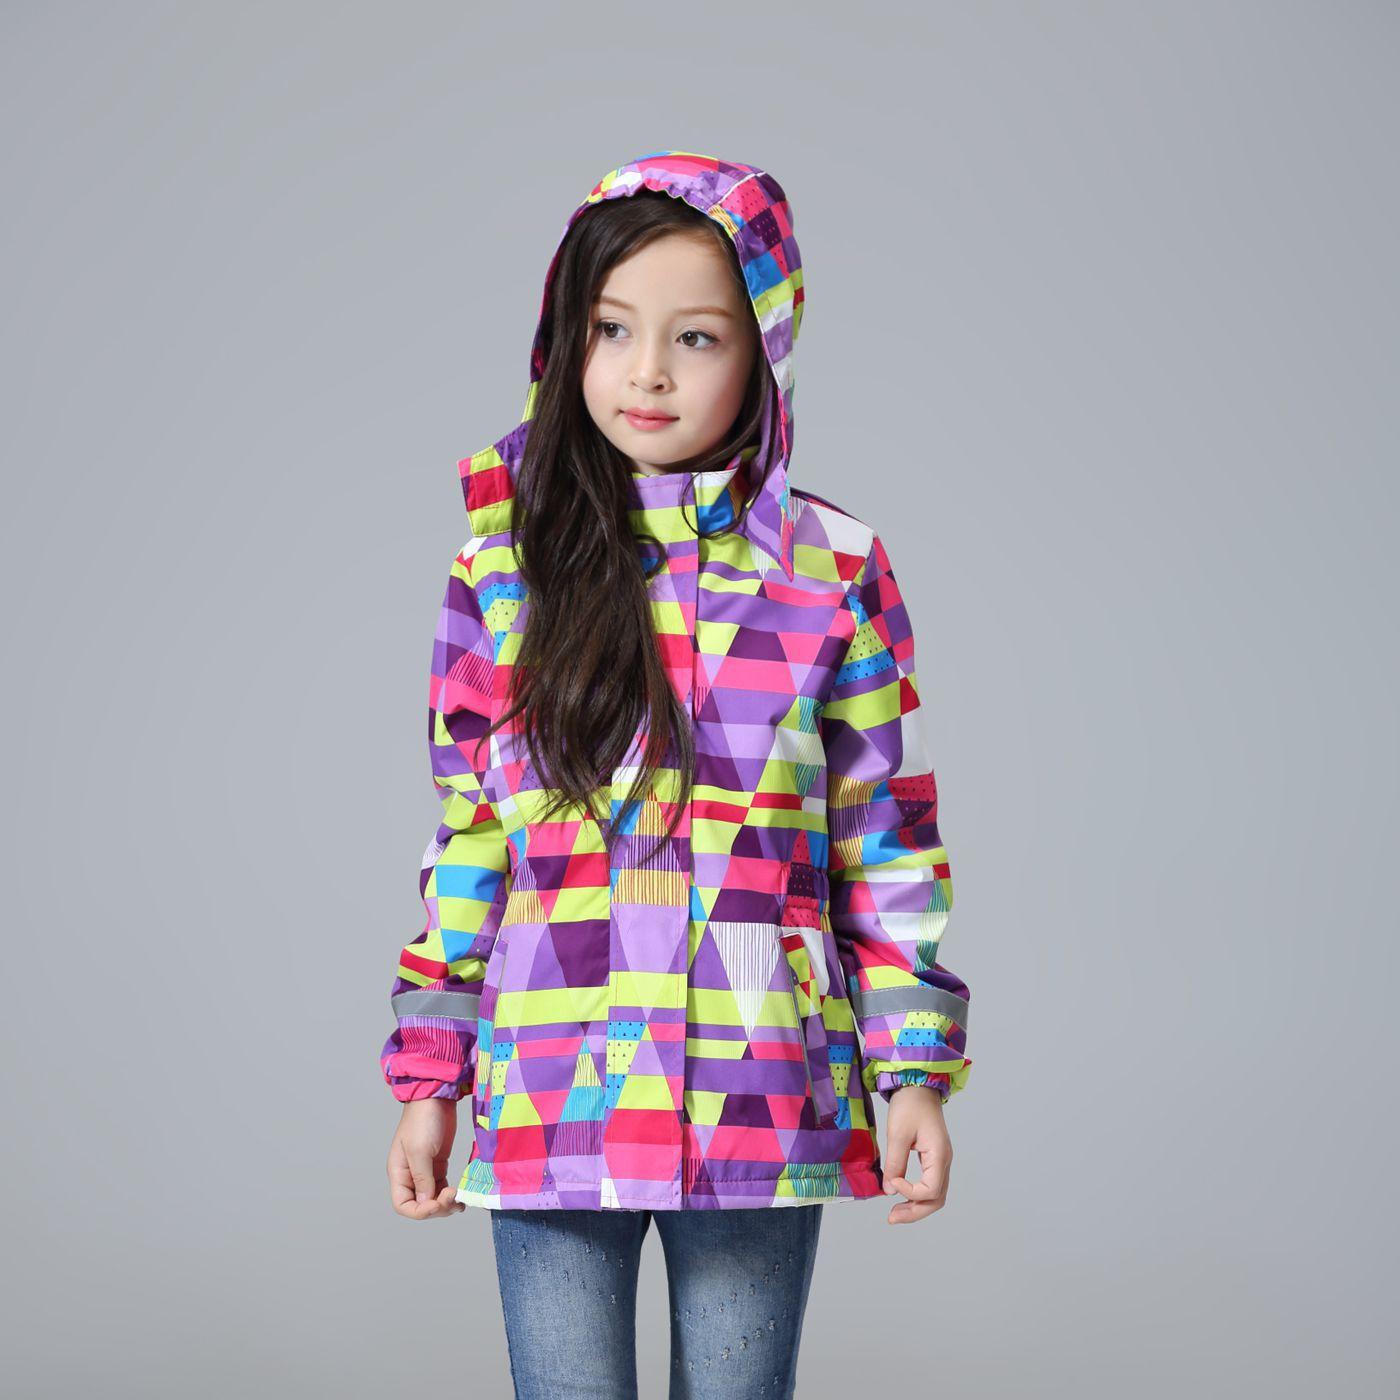 Водоустойчиви ветроустойчиви детски връхни дрехи Бебешки момичета якета Деца Детско палто топло полярно руно зима есен пролет за 3-12T